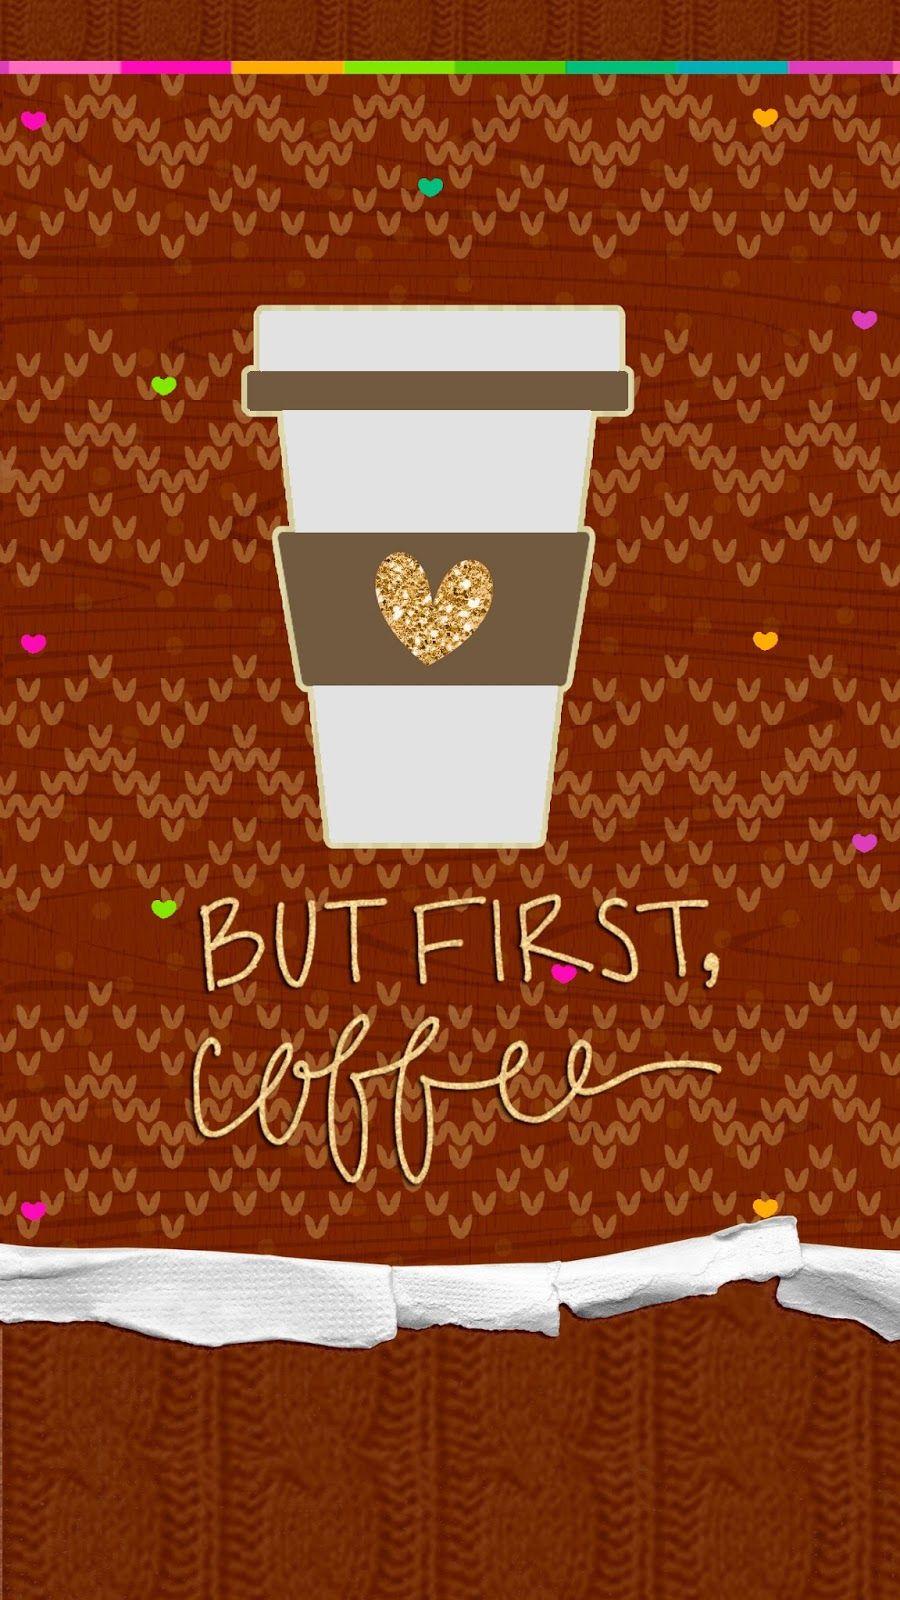 But first, Coffee! Iphone wallpaper, Winter coffee, Tea